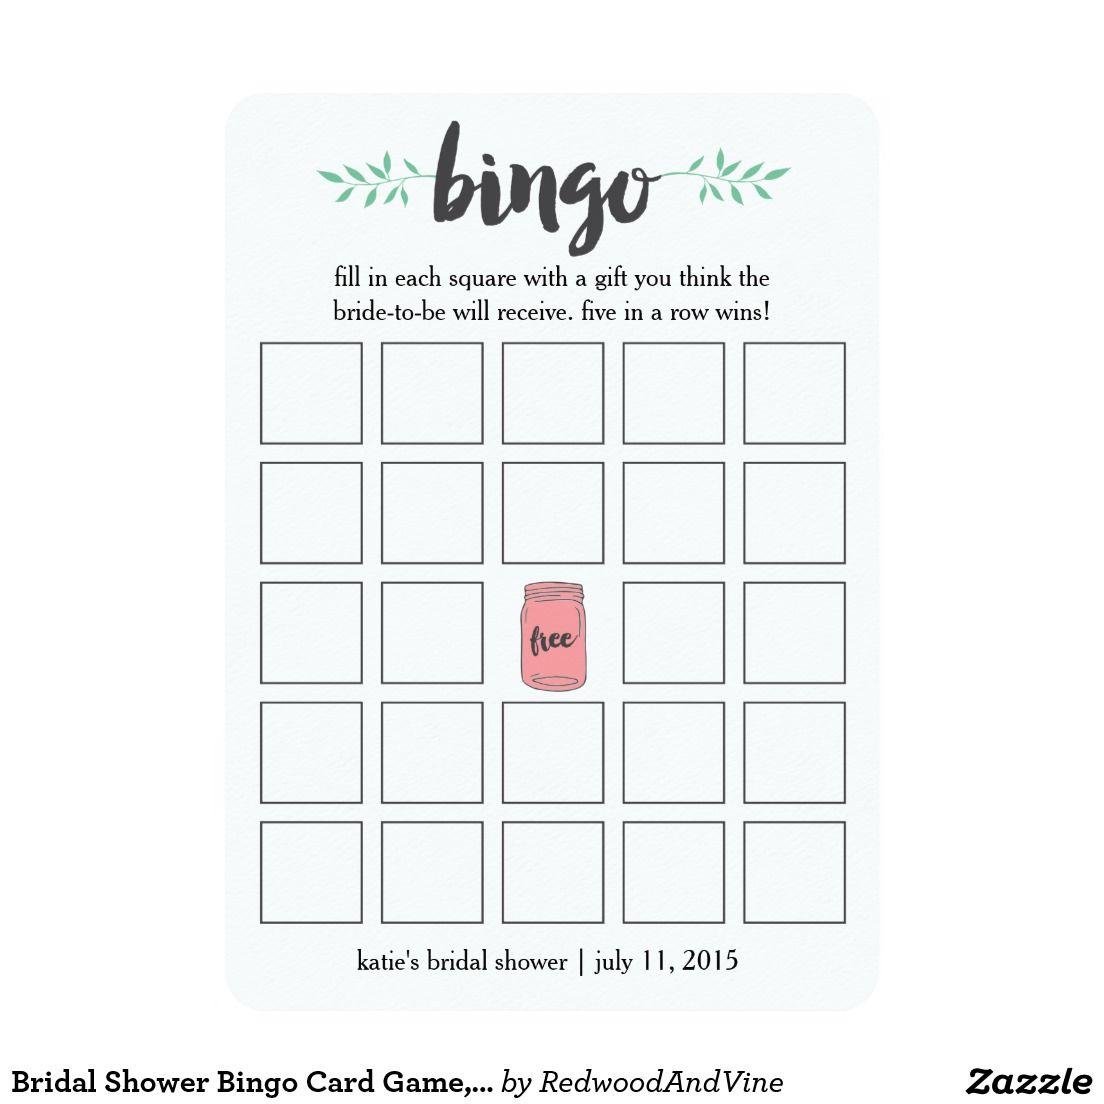 Bridal Shower Bingo Card Game, Botanical Mason Jar   Zazzle